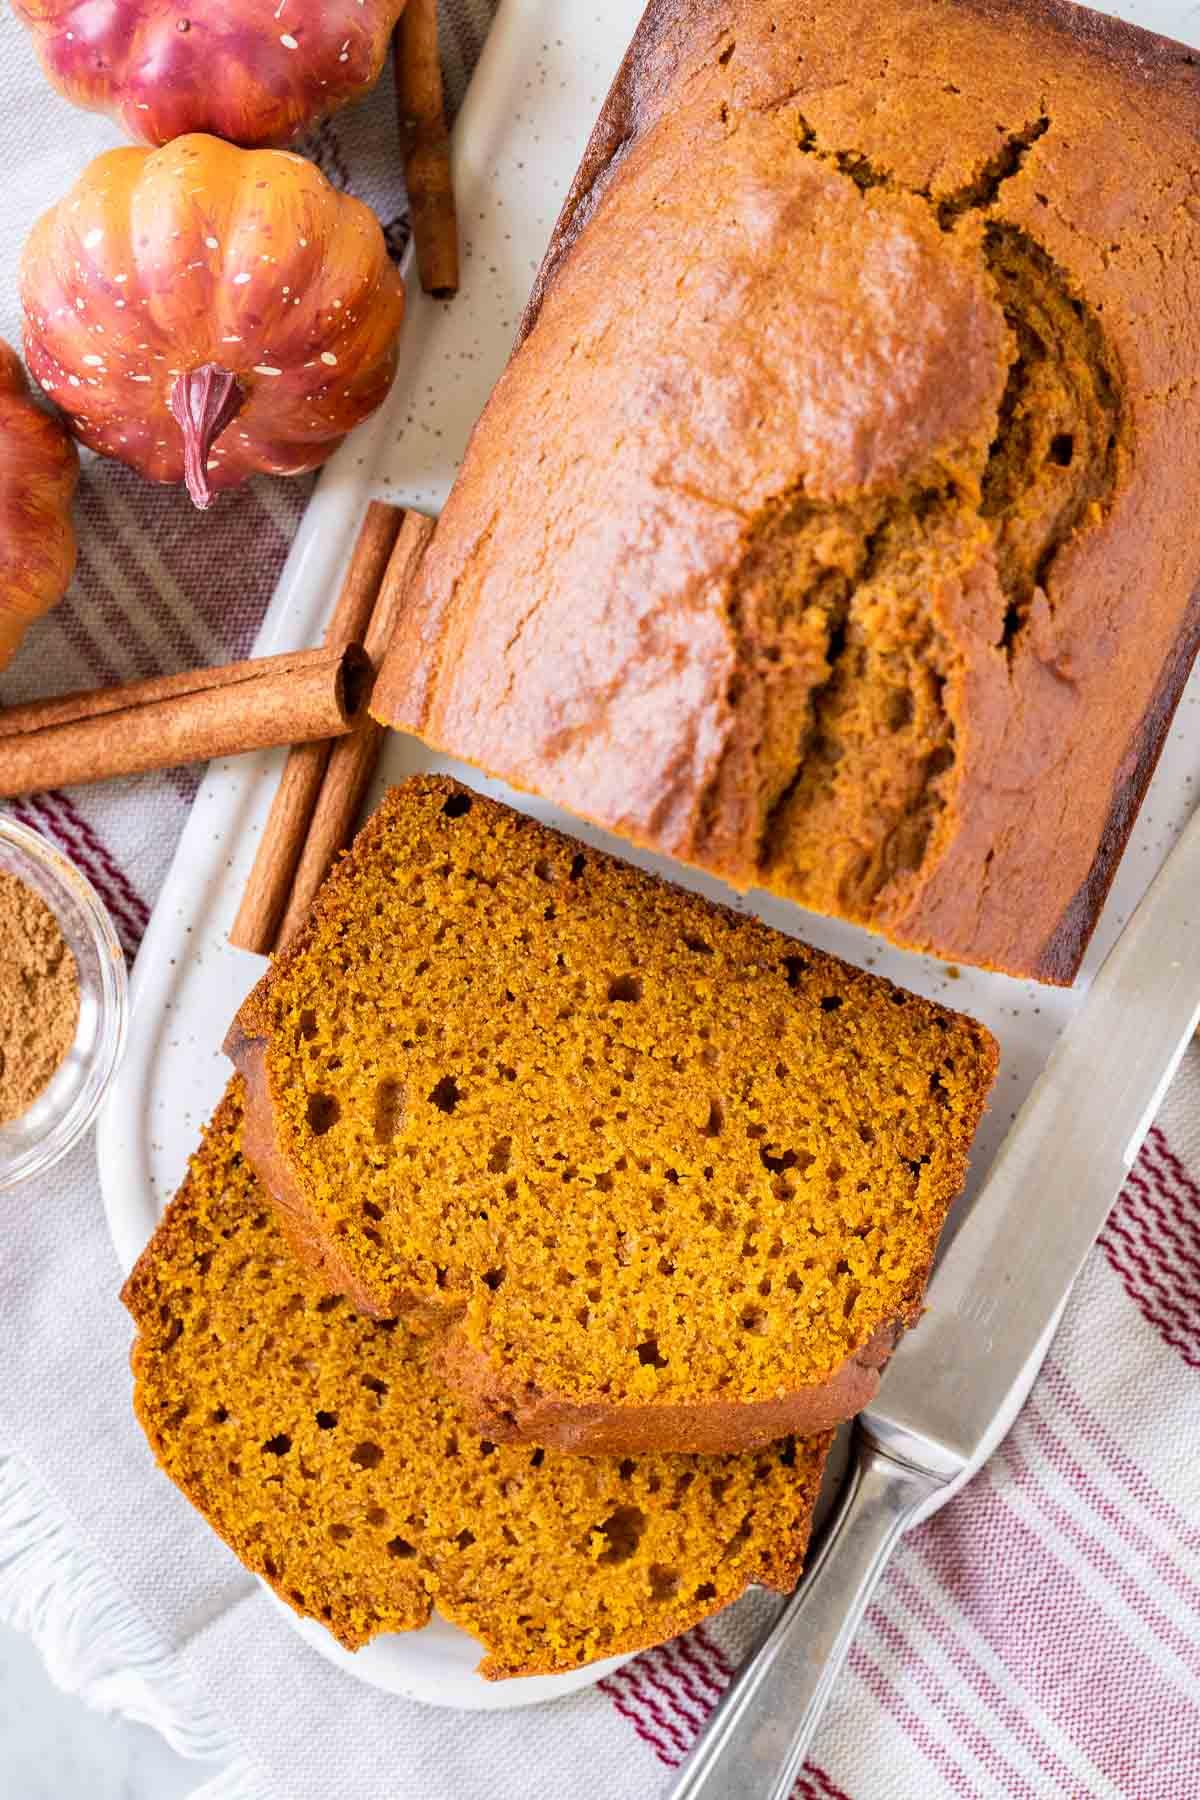 Slices of pumpkin bread on a serving platter